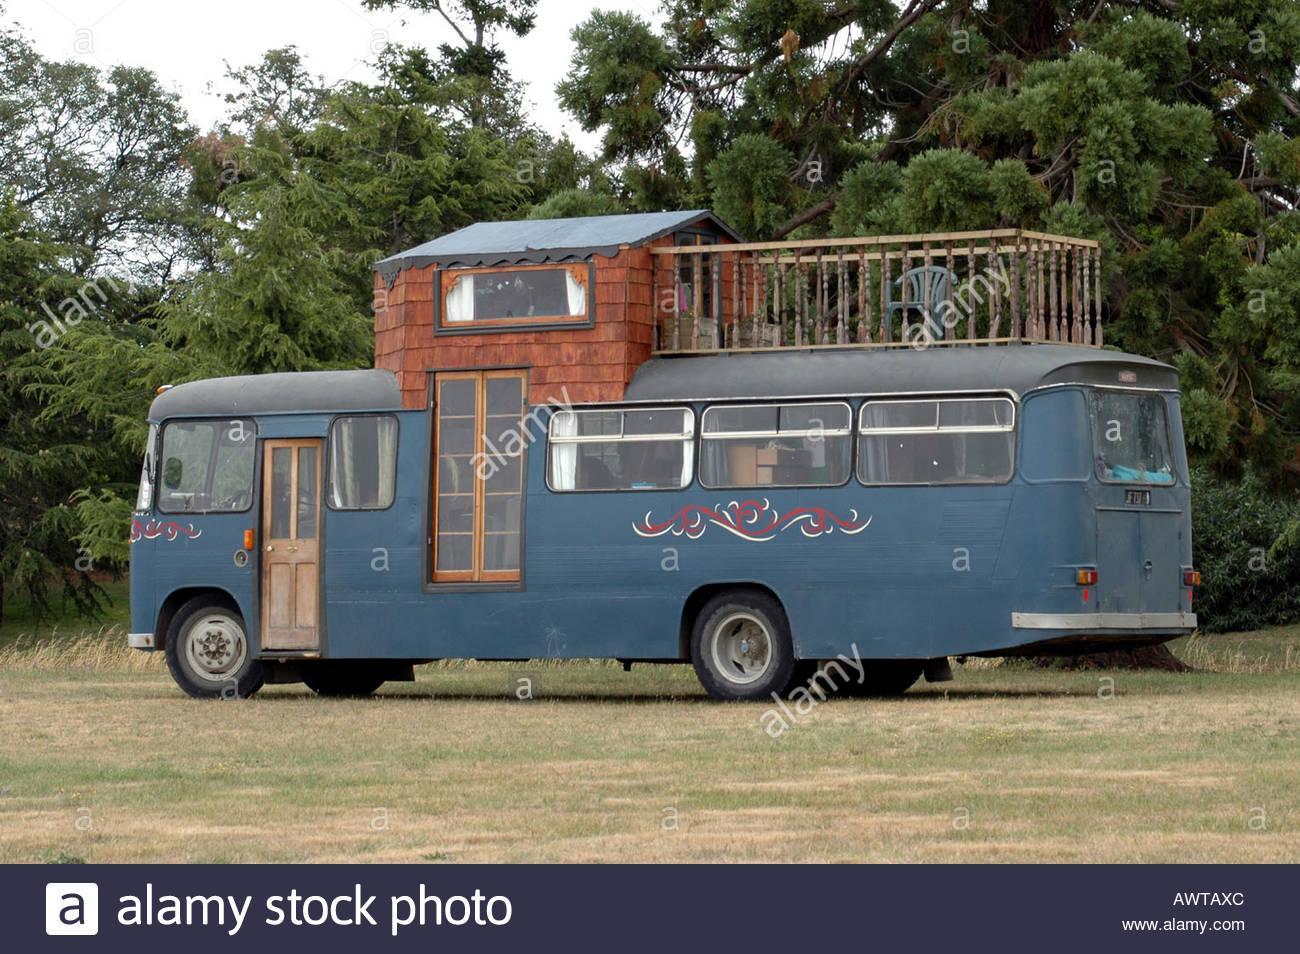 House Bus New Zealand Stock Photo: 9514027